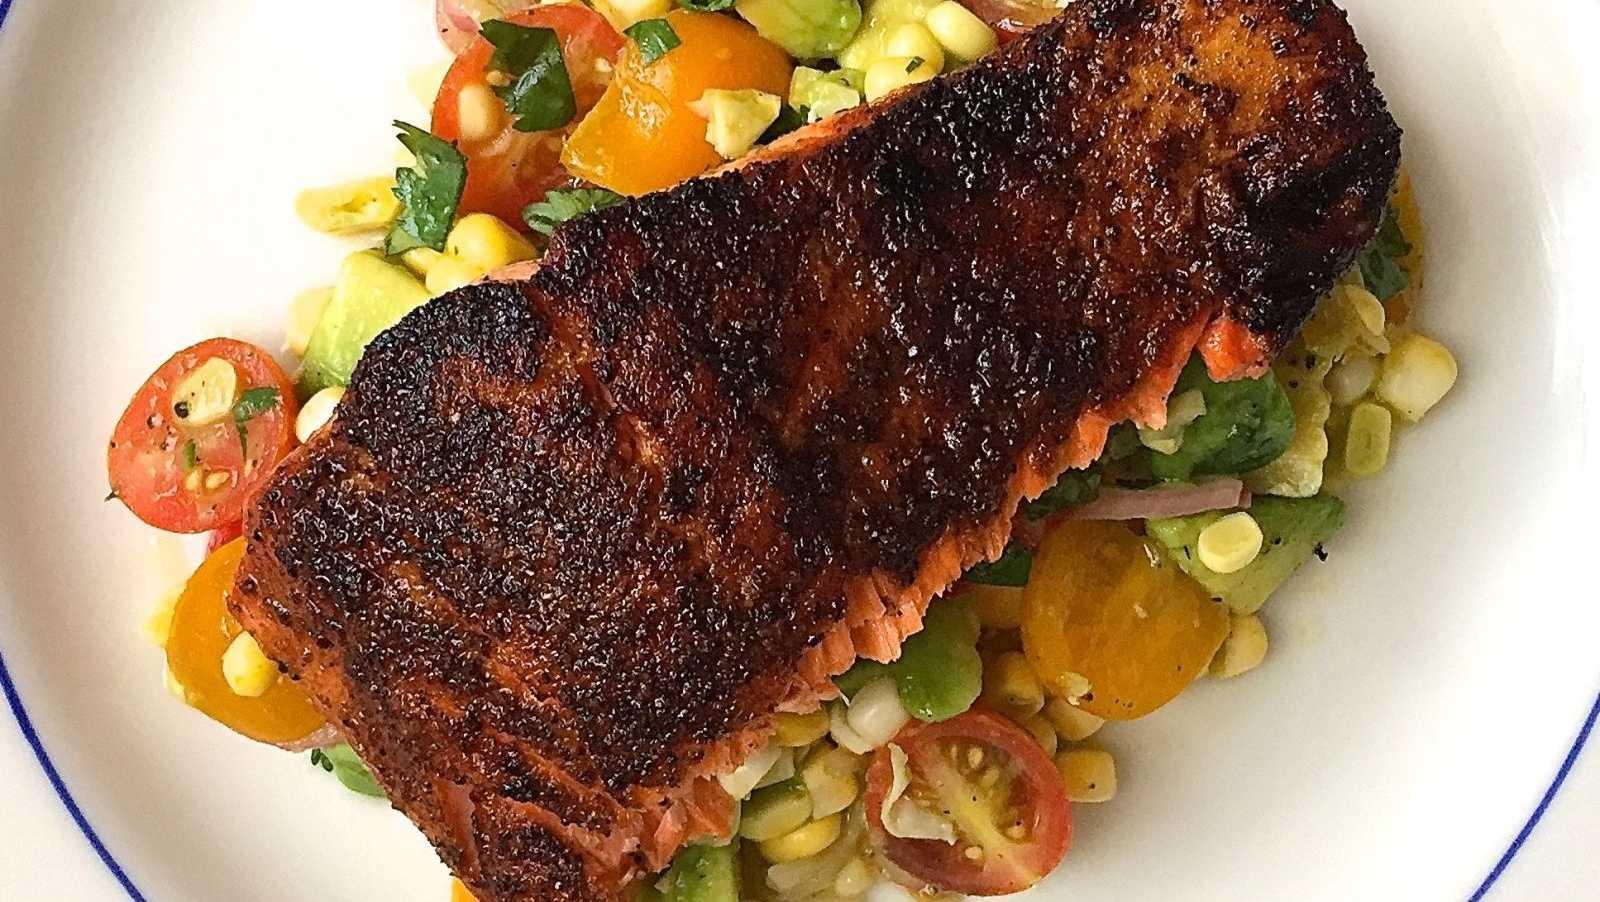 Blackened Salmon with Corn, Tomato, and Avocado Salad